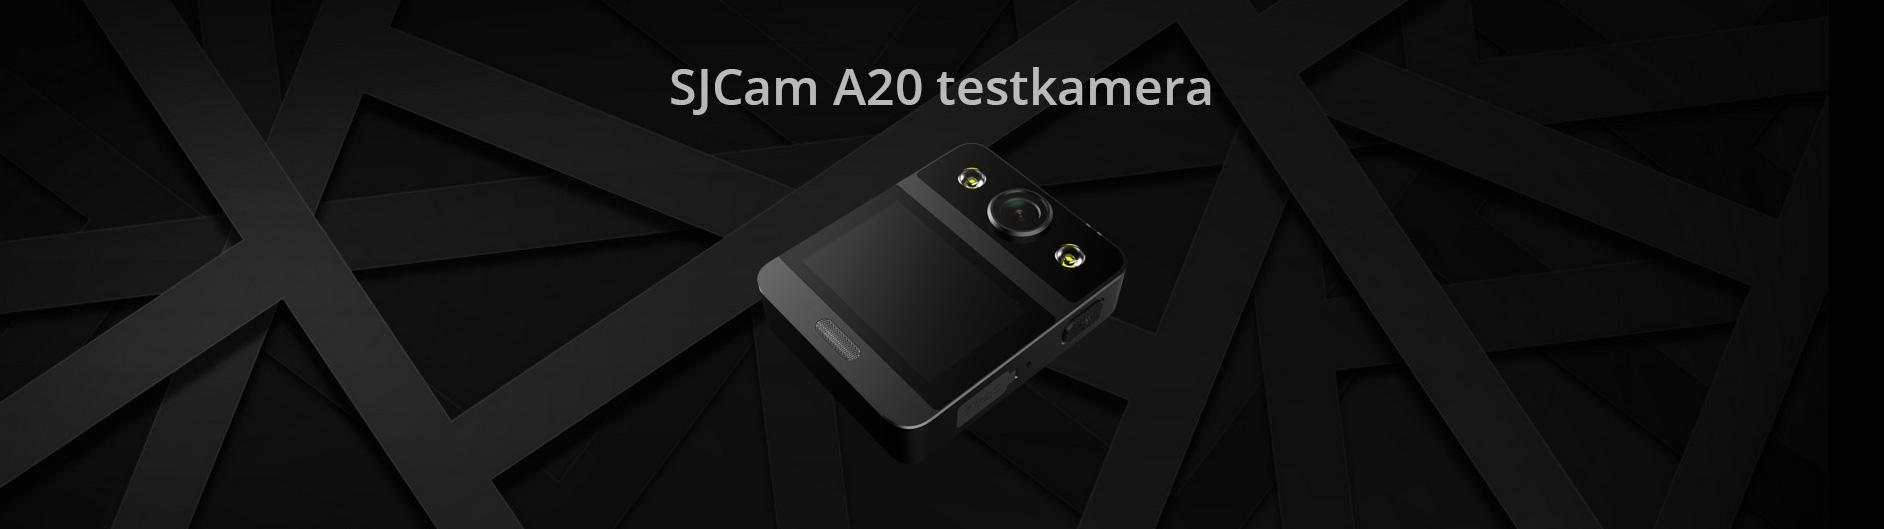 SJCam A20 testkamera